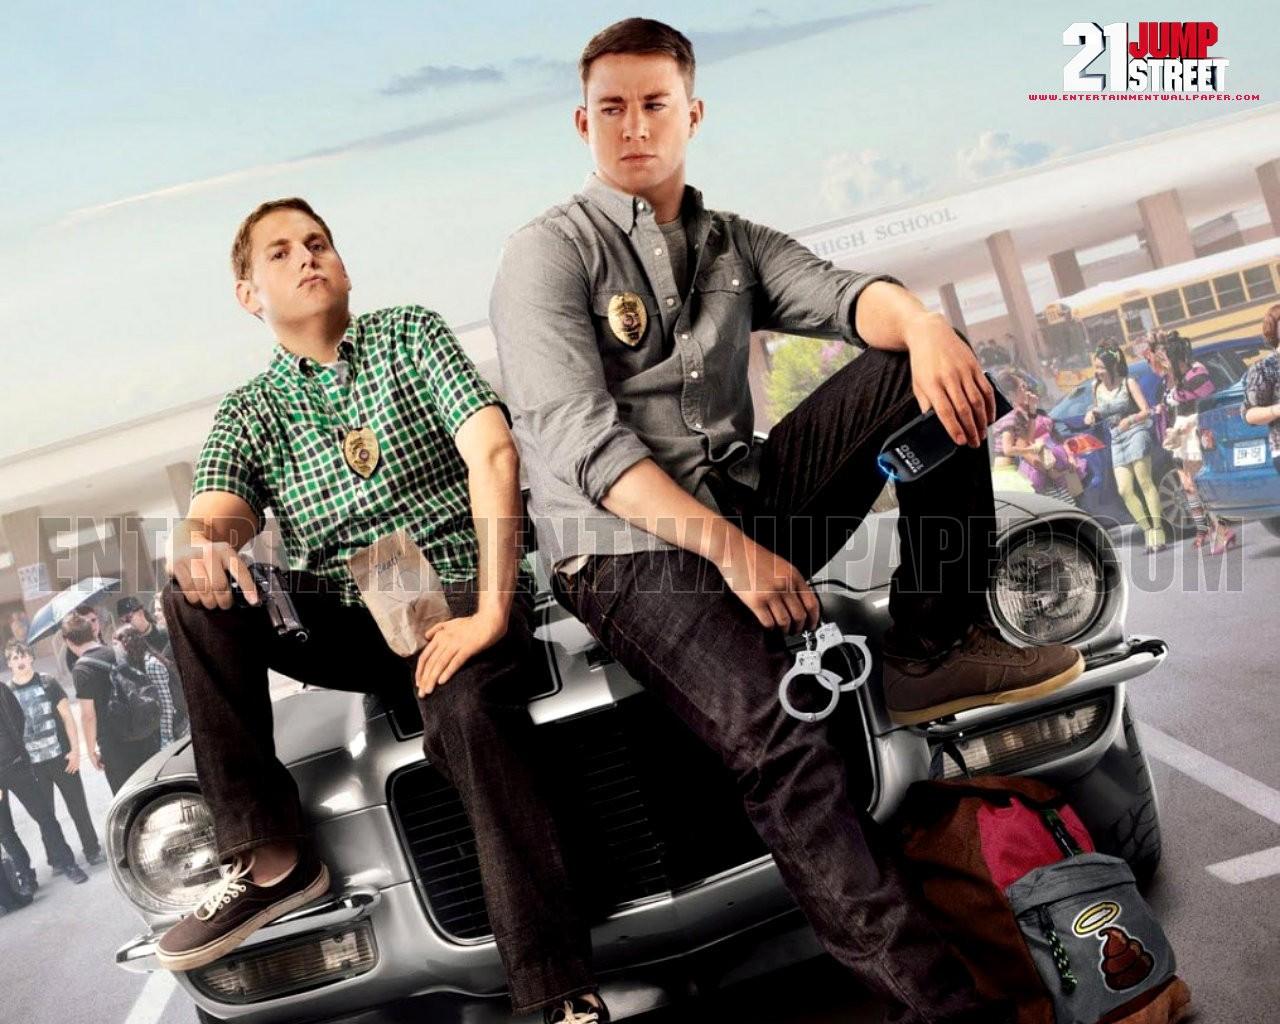 21 jump street movie download hd